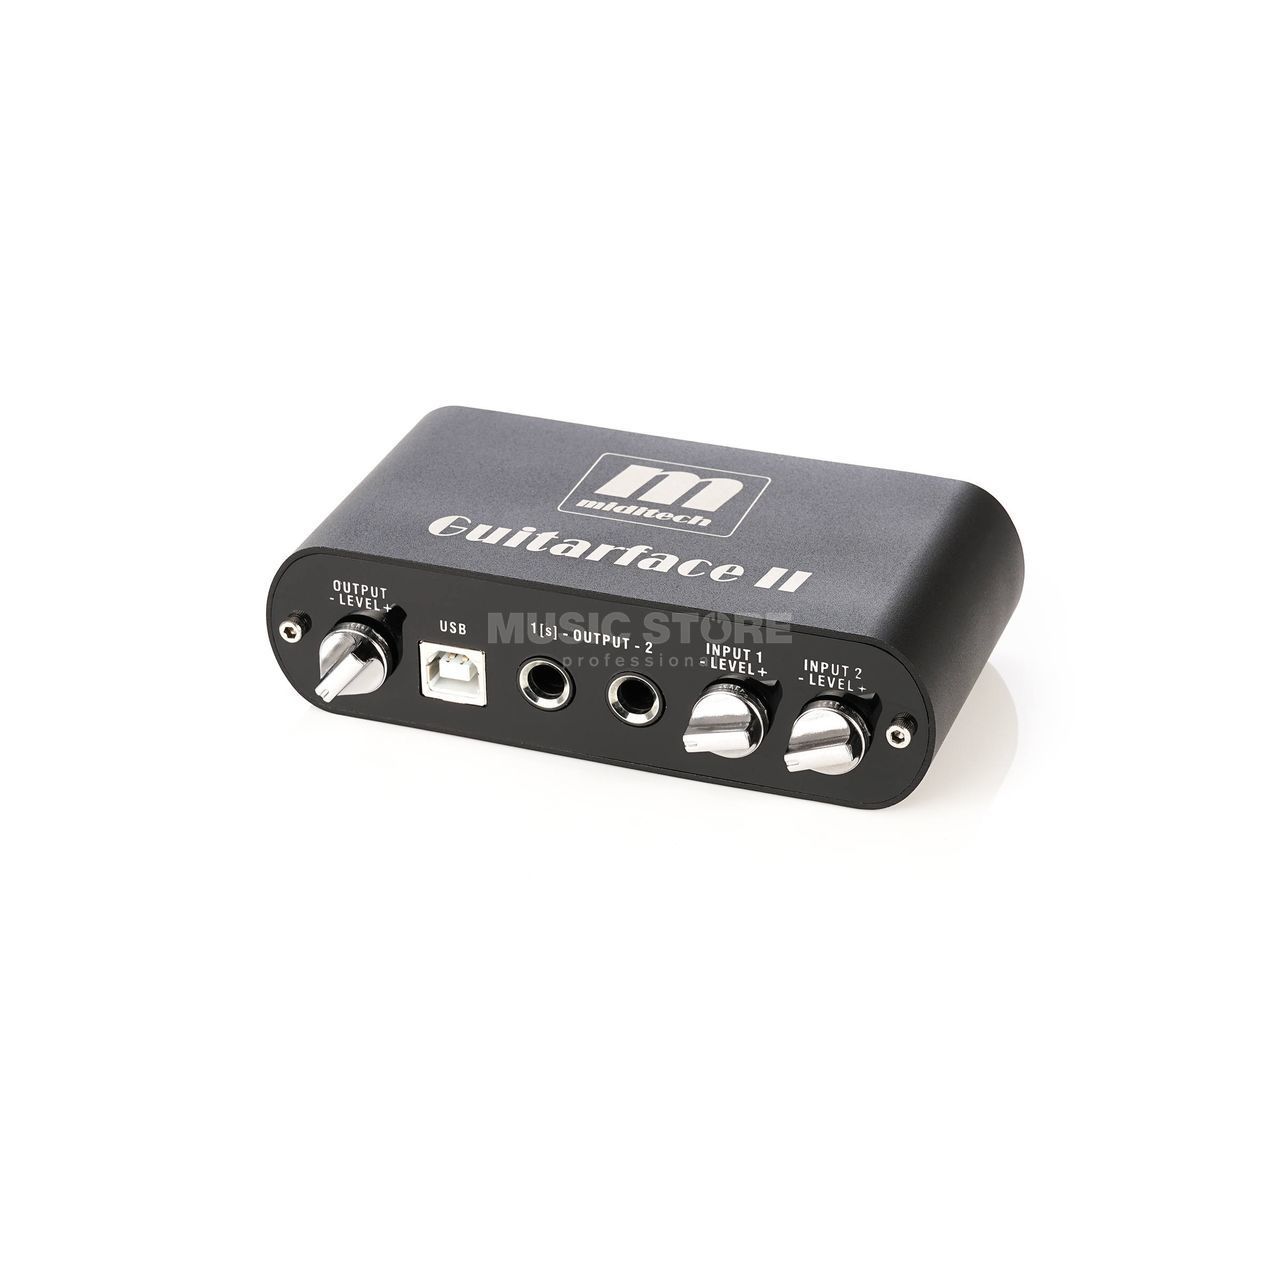 miditech guitarface ii usb audio interface dv247 en gb. Black Bedroom Furniture Sets. Home Design Ideas